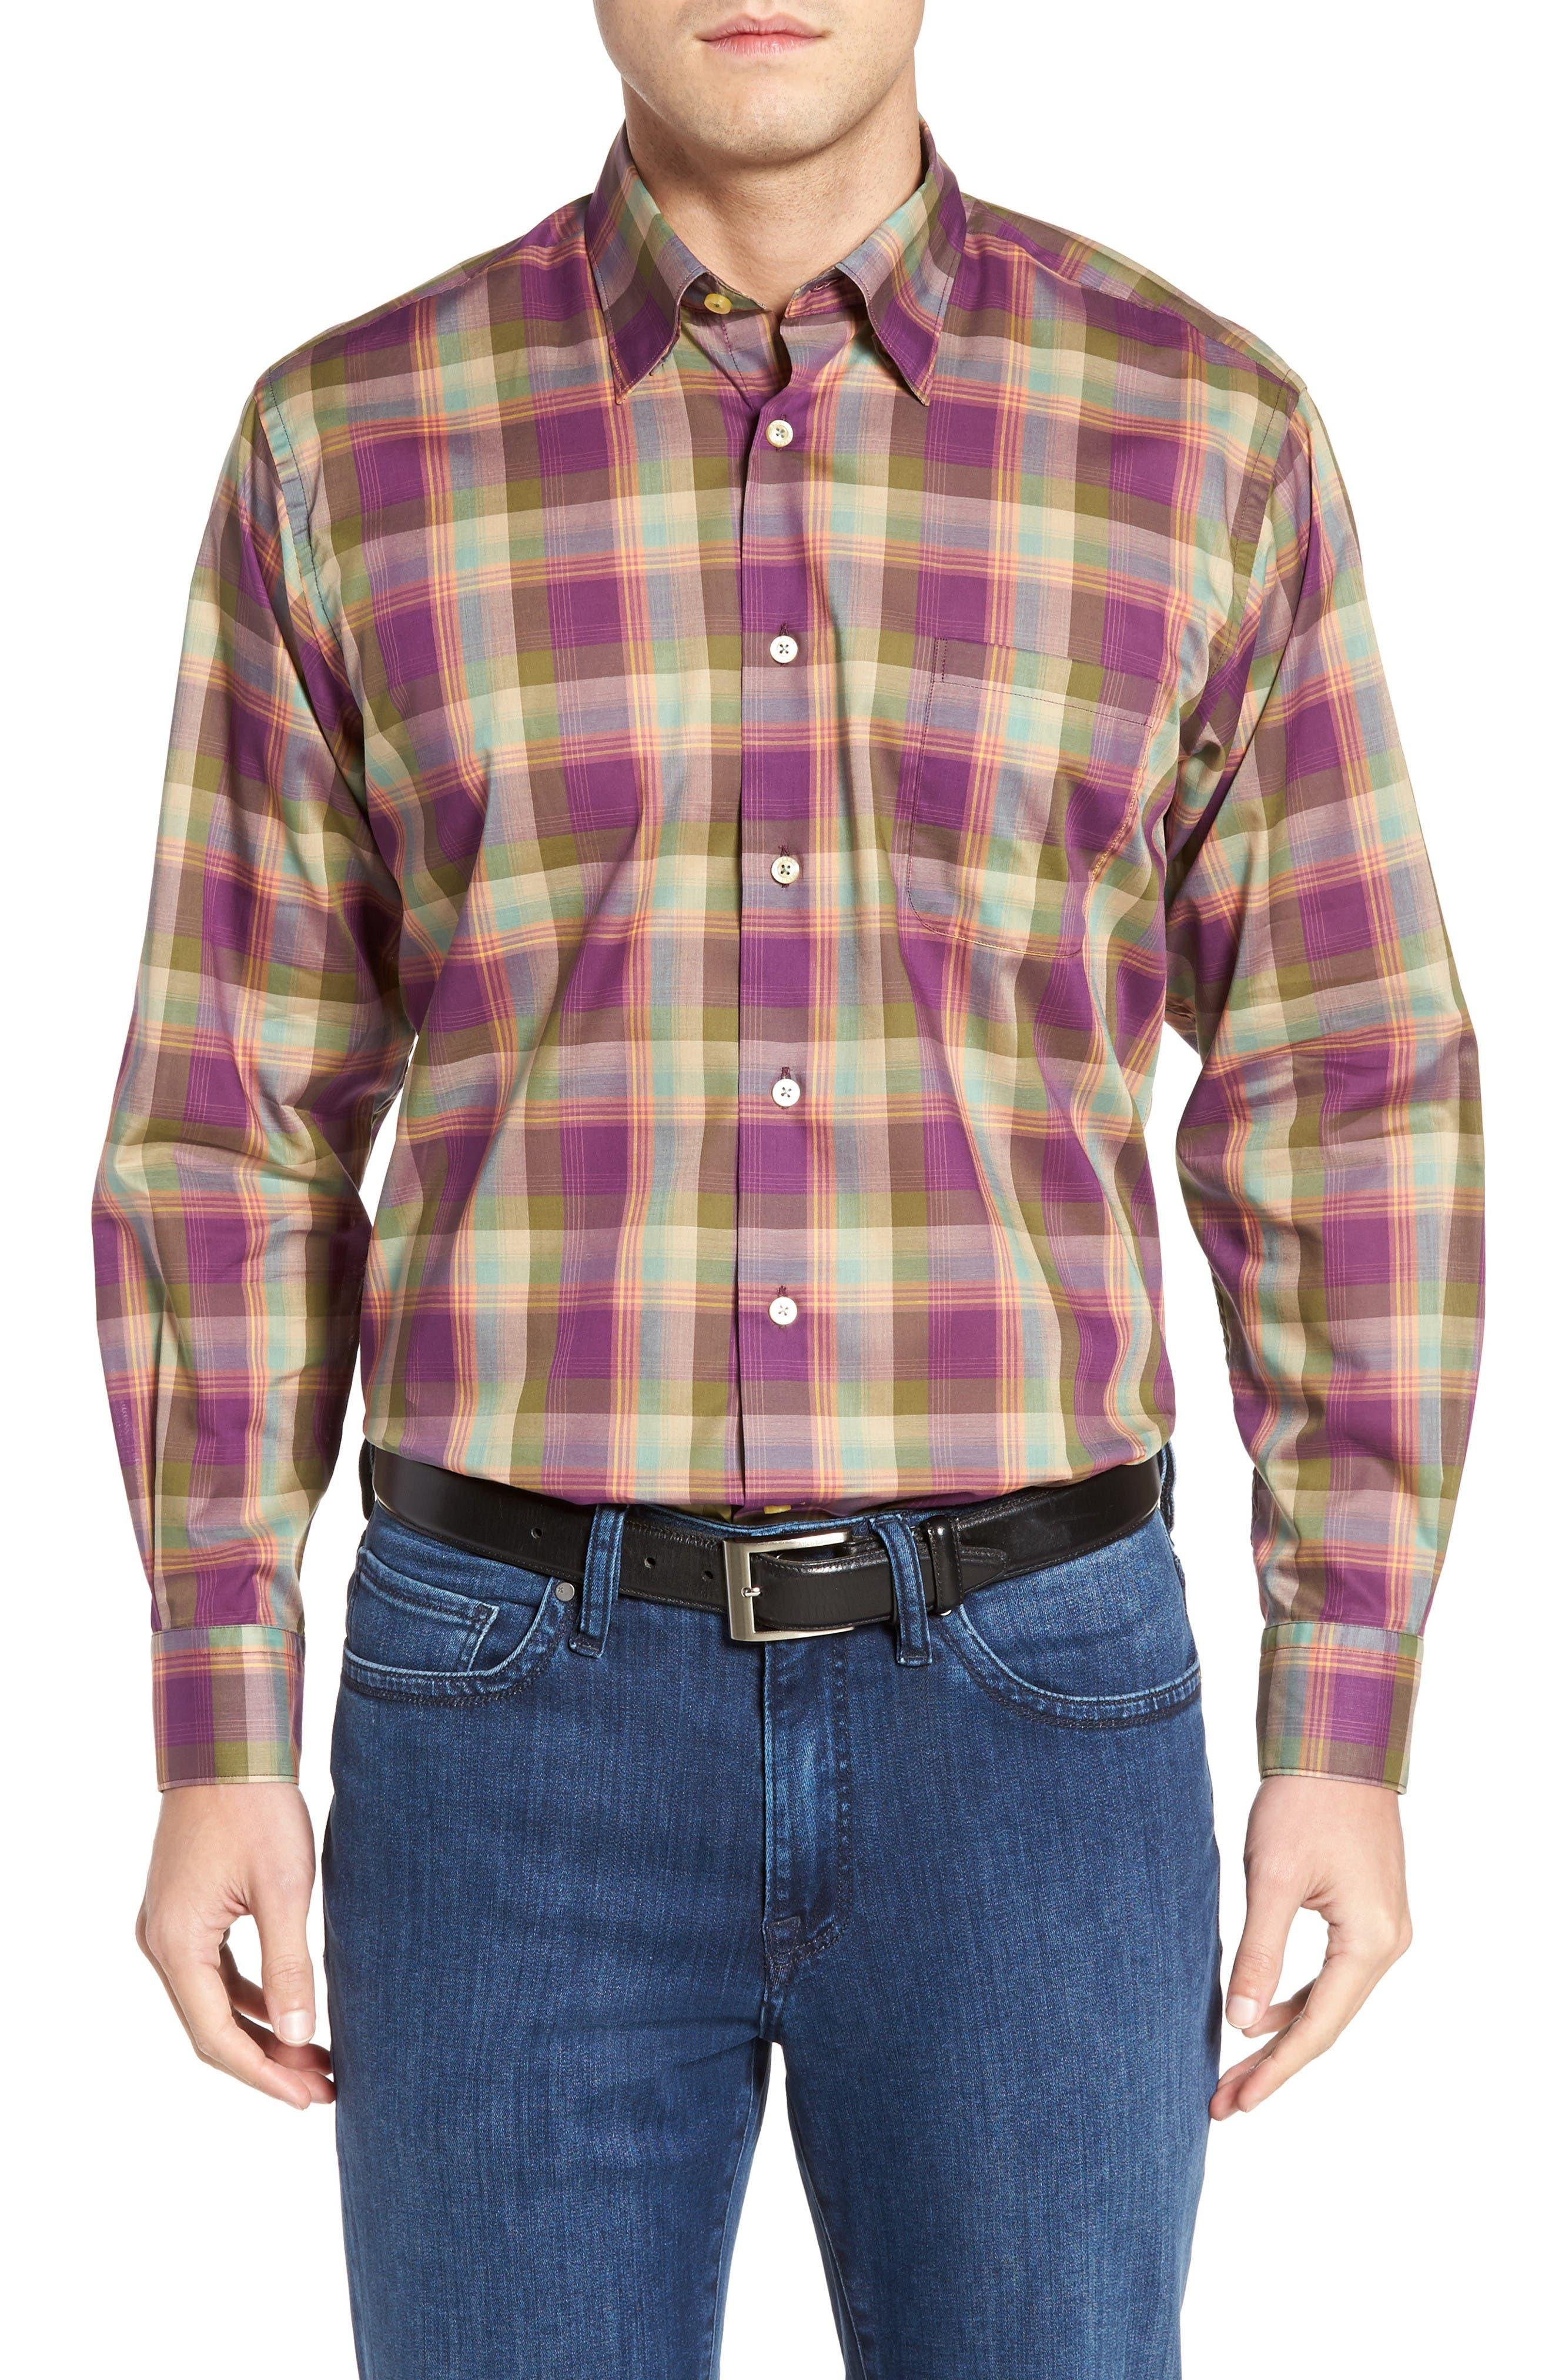 Alternate Image 1 Selected - Robert Talbott Anderson Classic Fit Plaid Sport Shirt